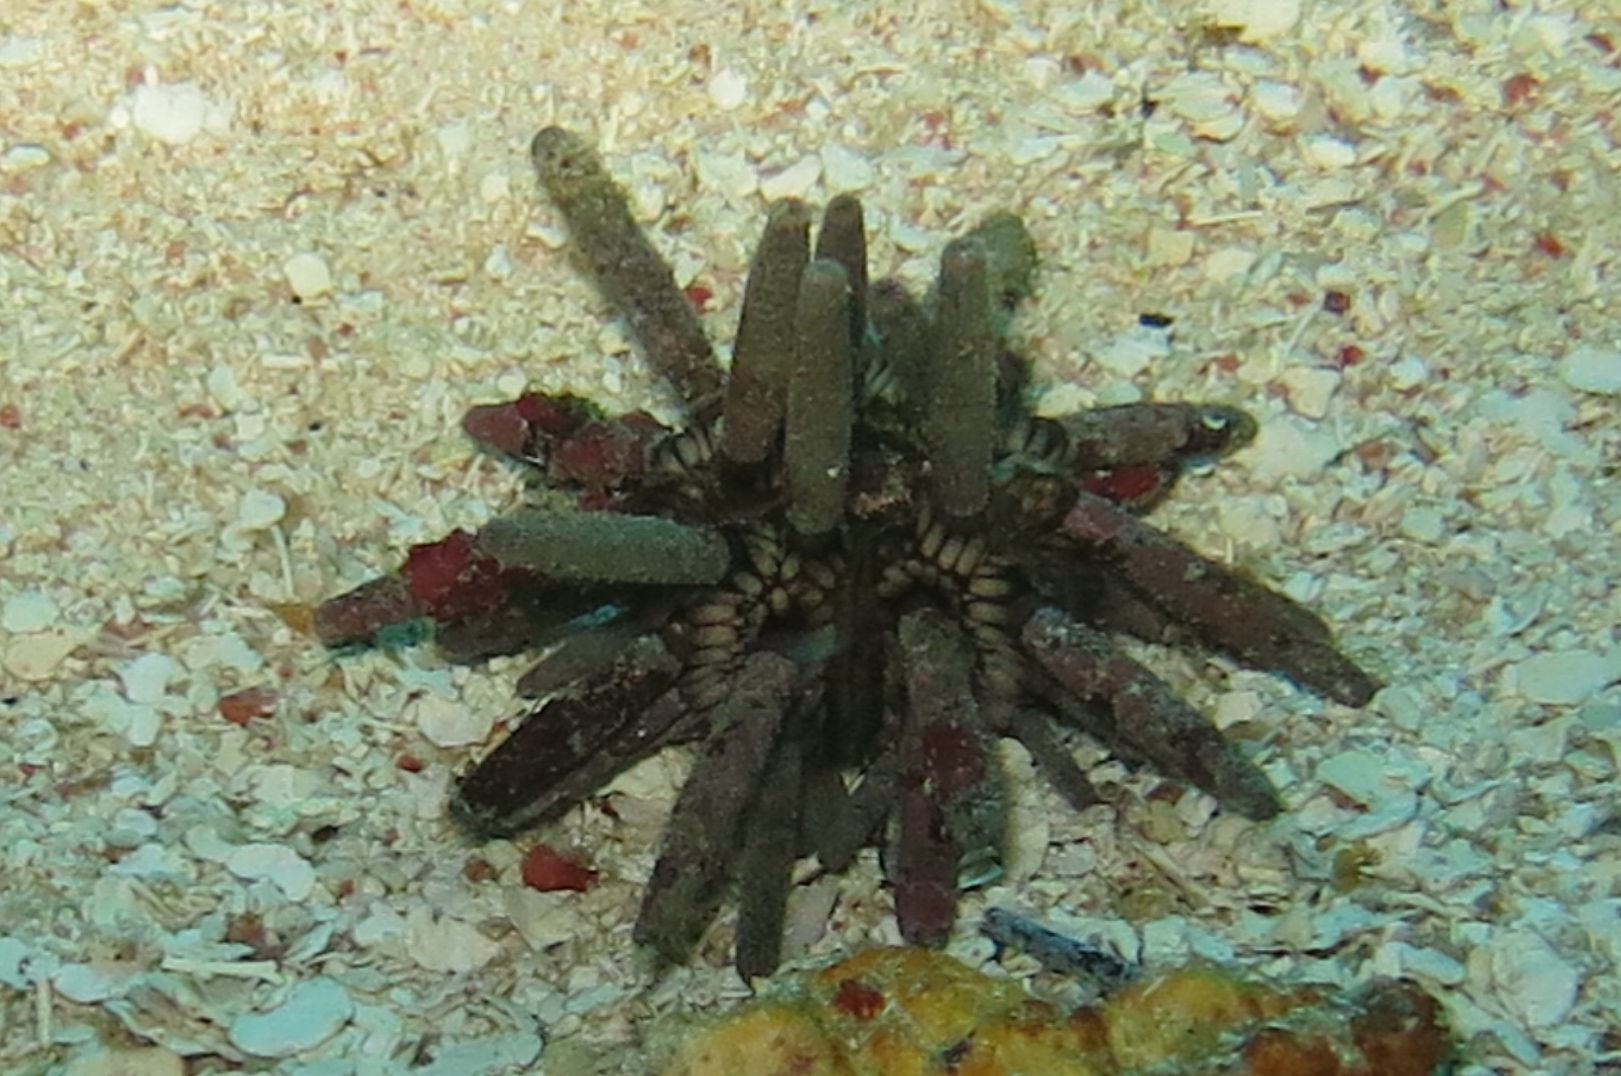 Slate Pencil Sea Urchin